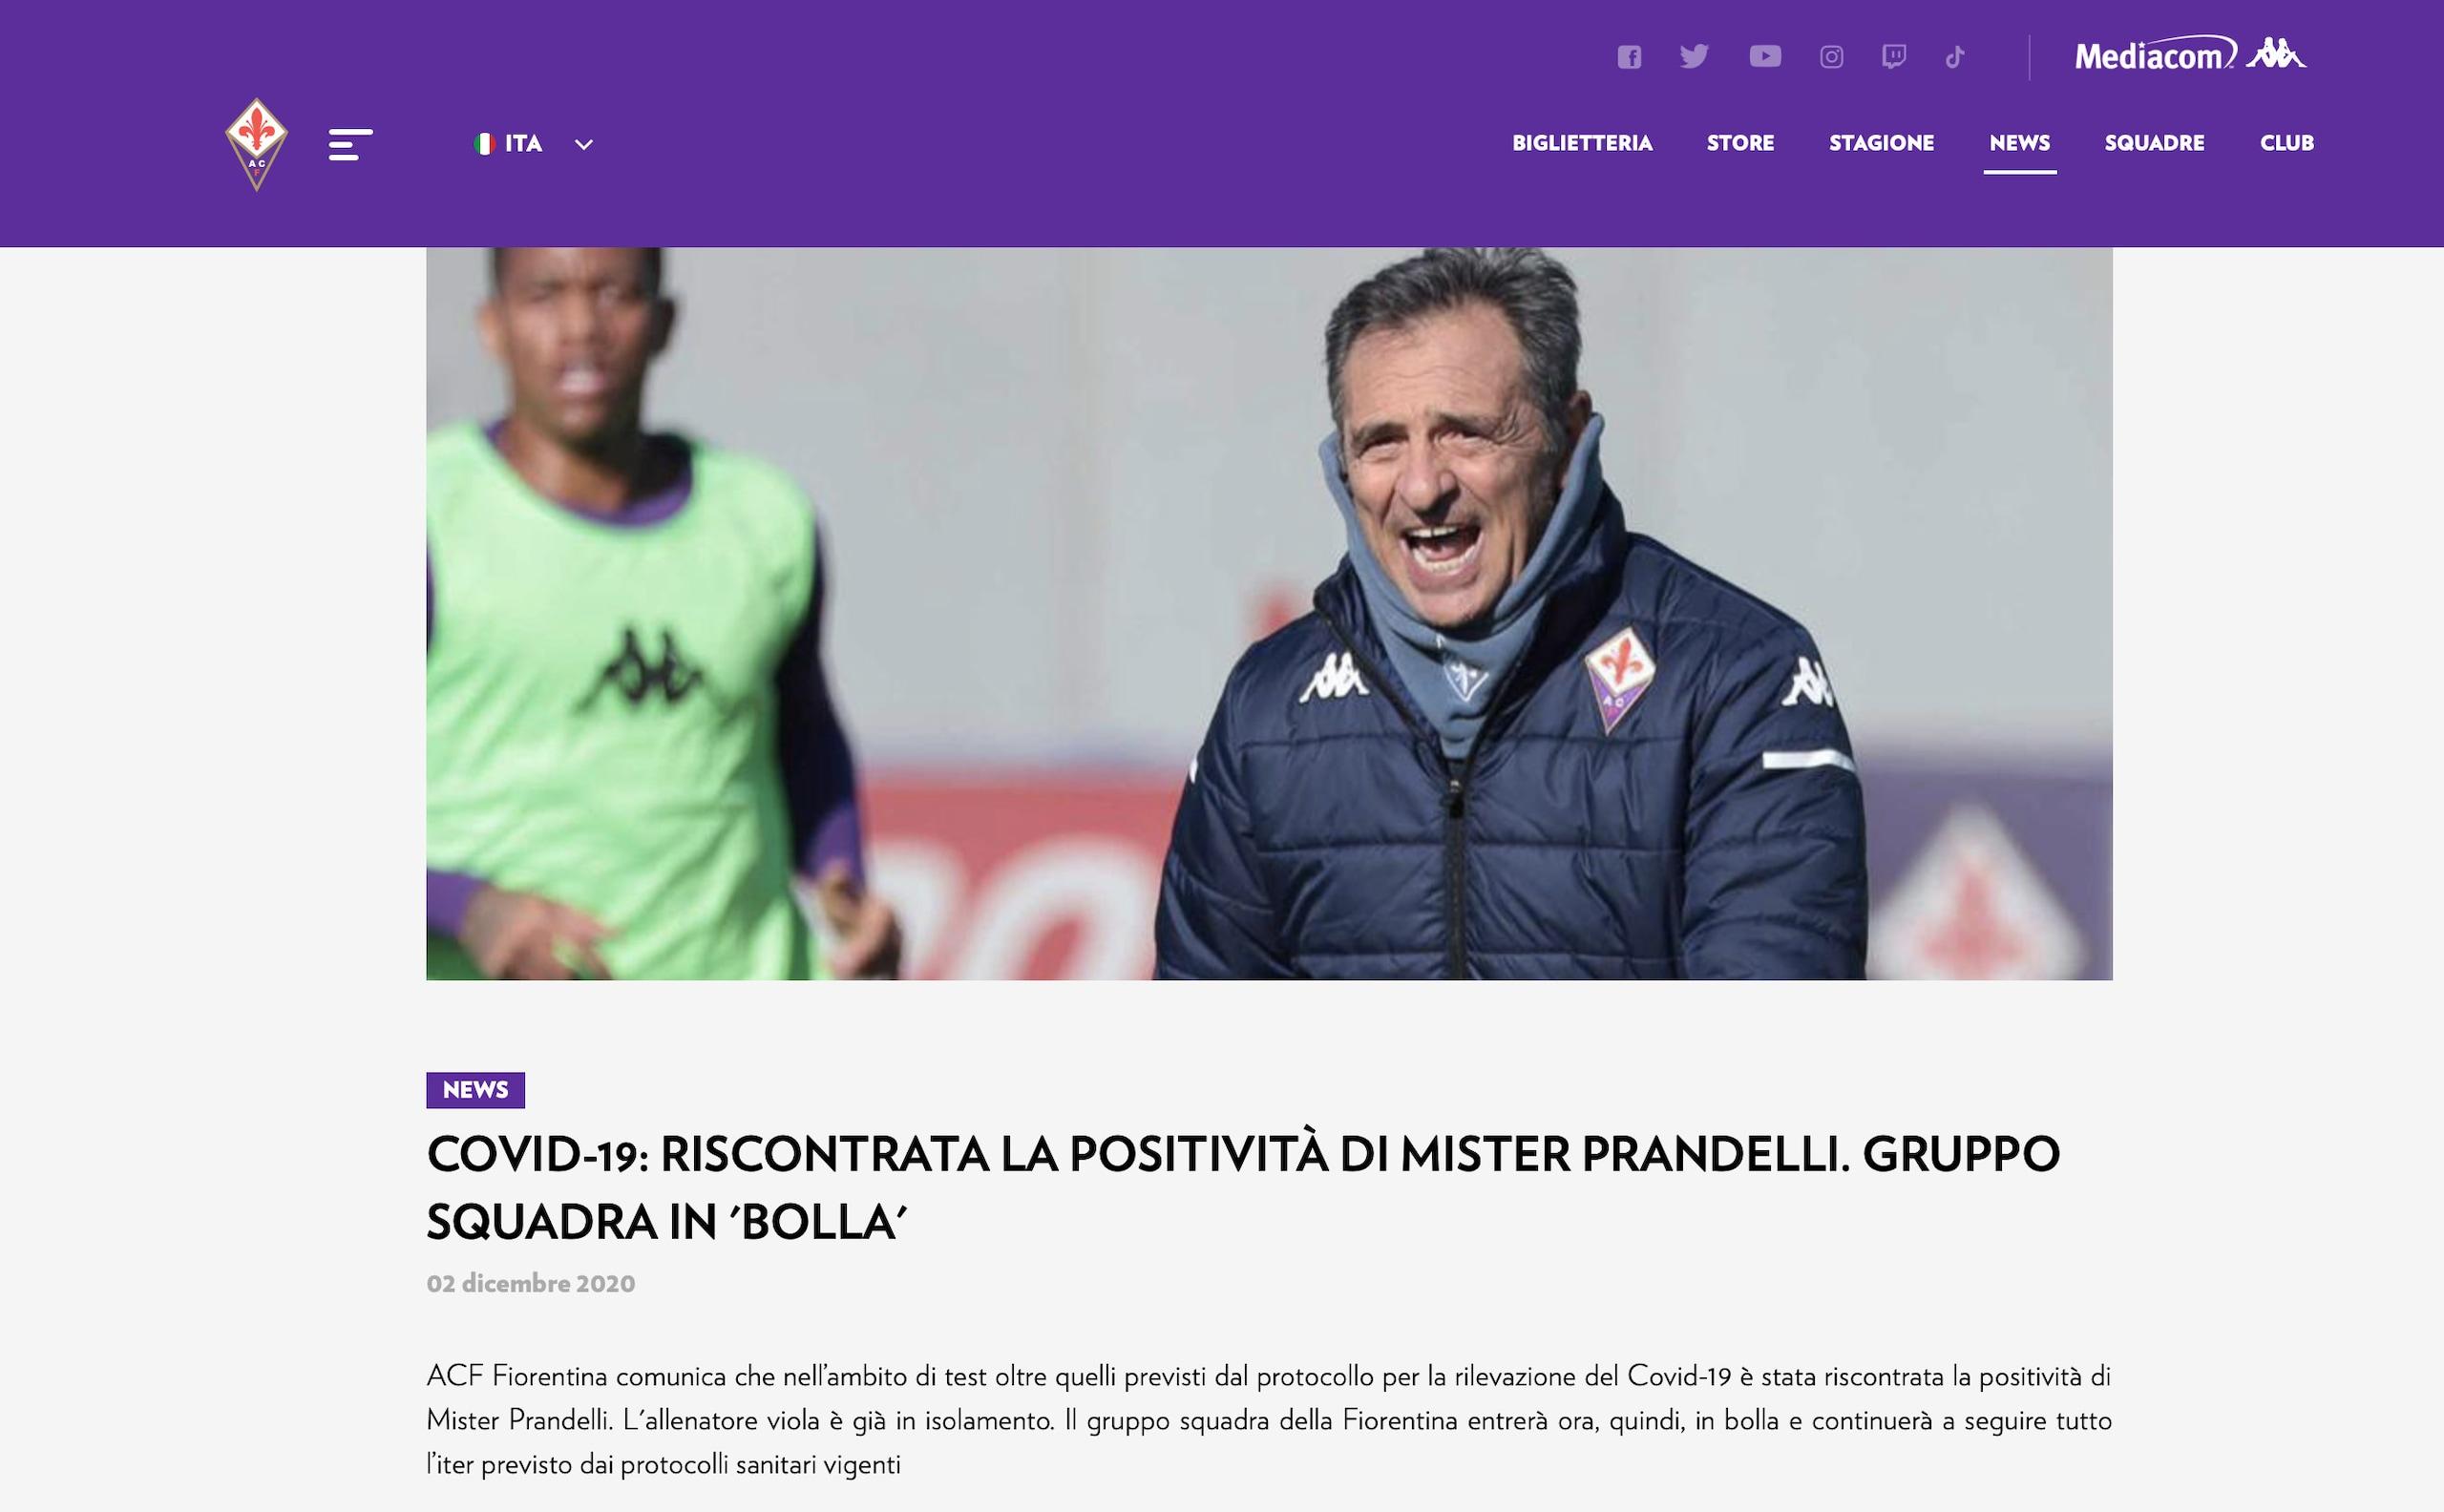 Fiorentina, Prandelli positivo al coronavirus